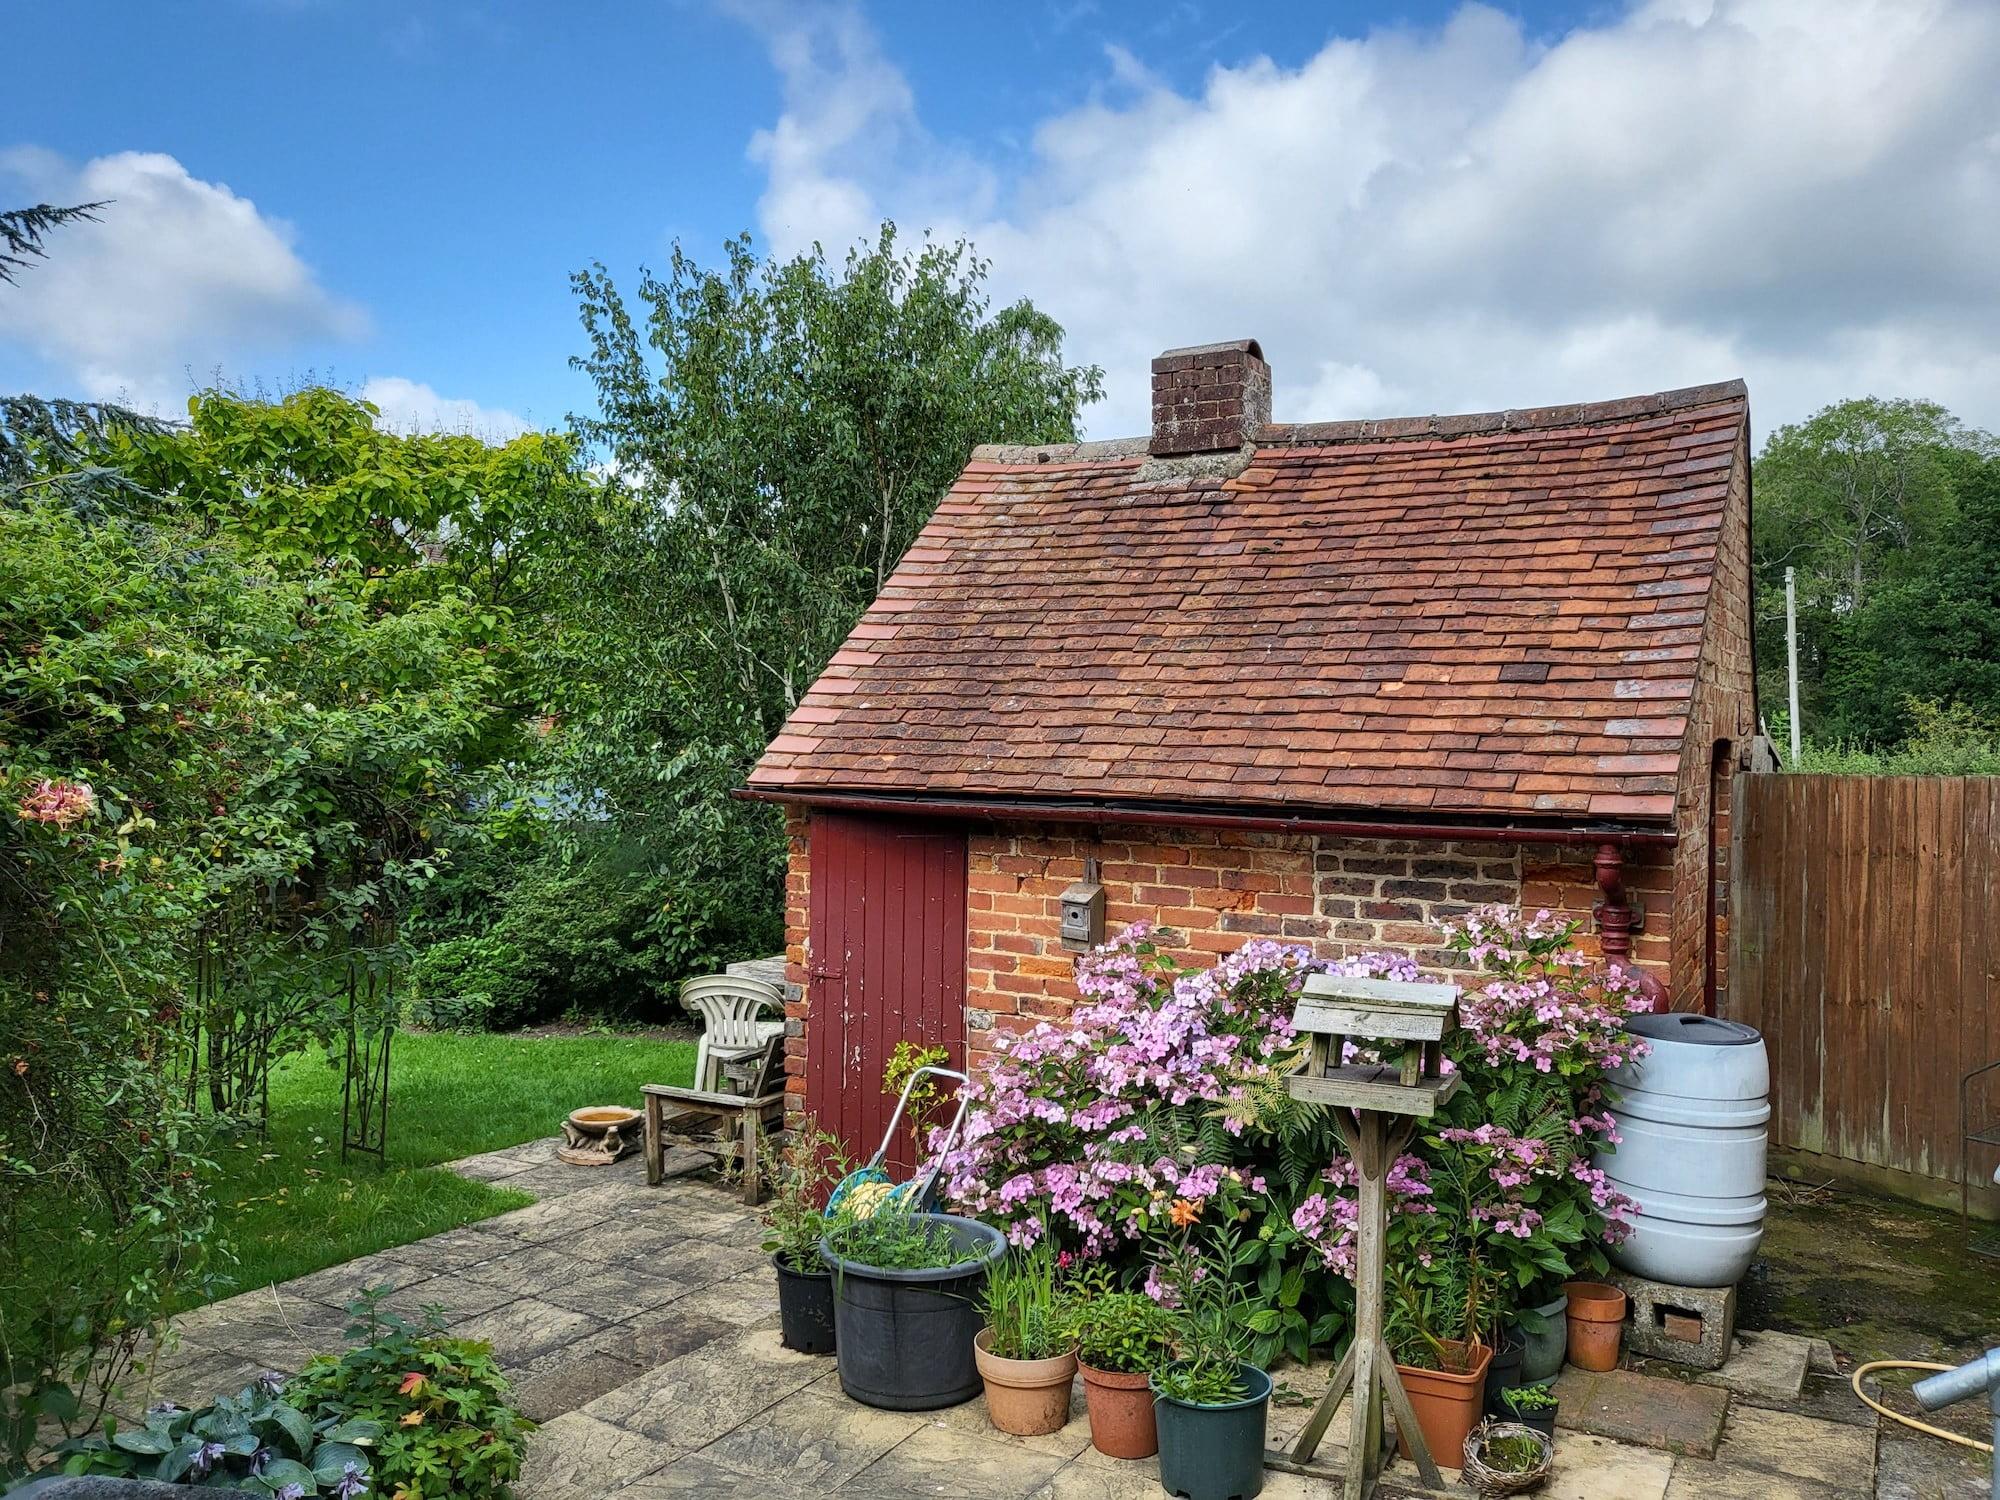 Photo of a garden taken with the Galaxy Z Flip 3.